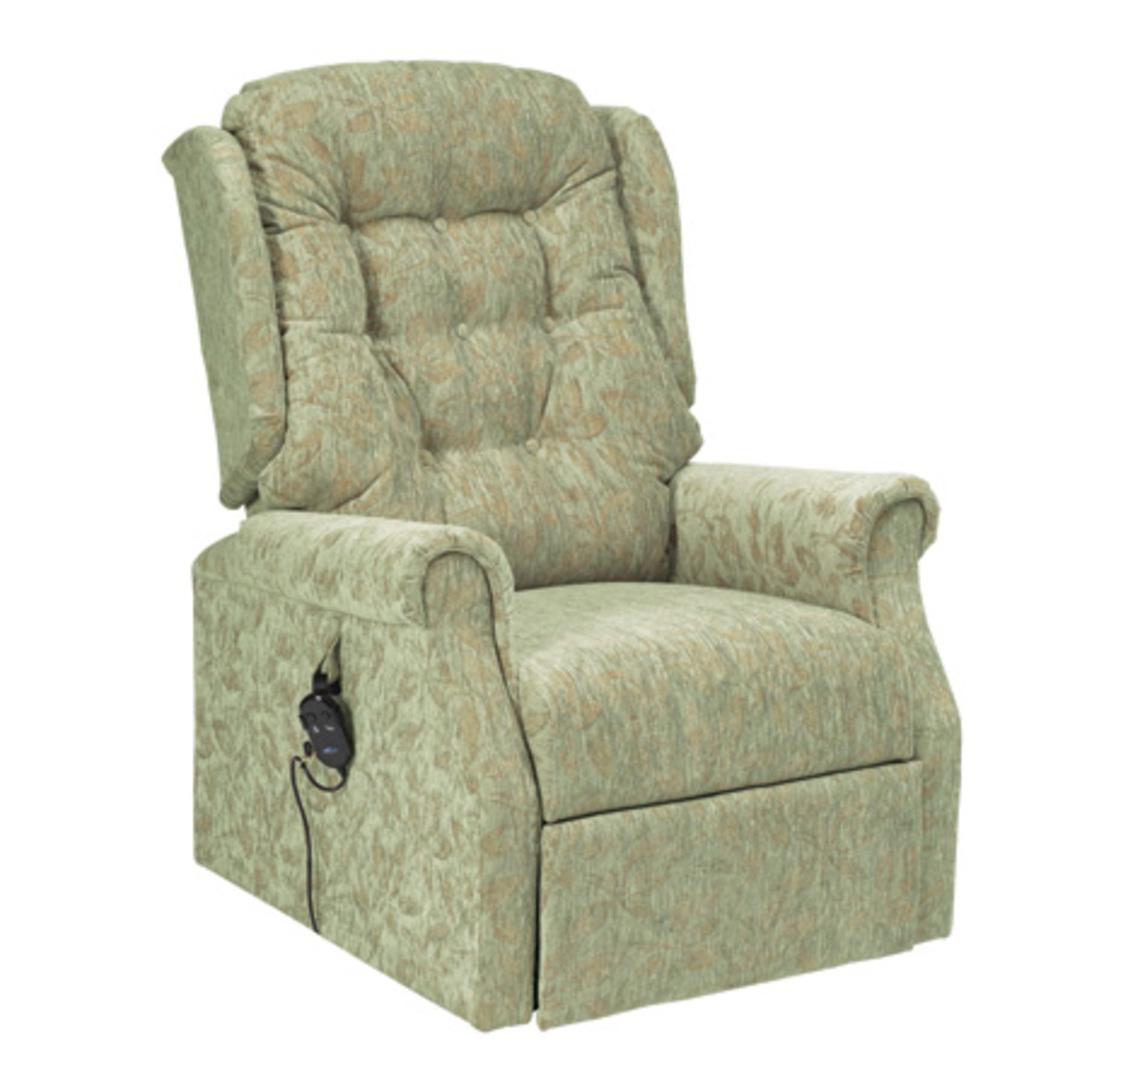 swivel chair risers retro oz design dallas riser recliner world of scooters manchester